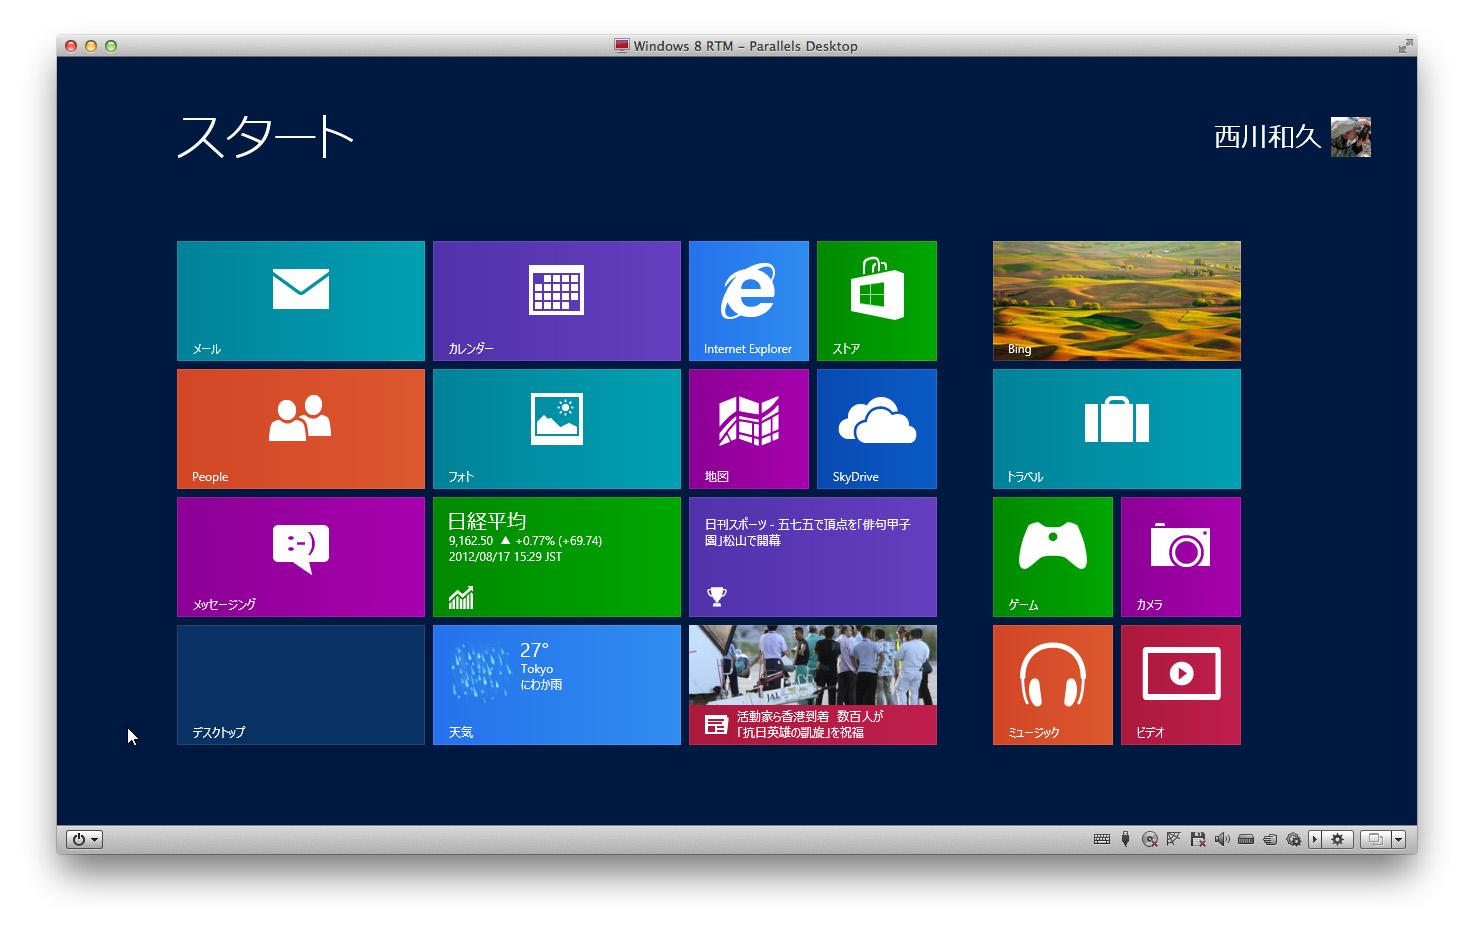 Windows 7から大きな変化となったWindows 8